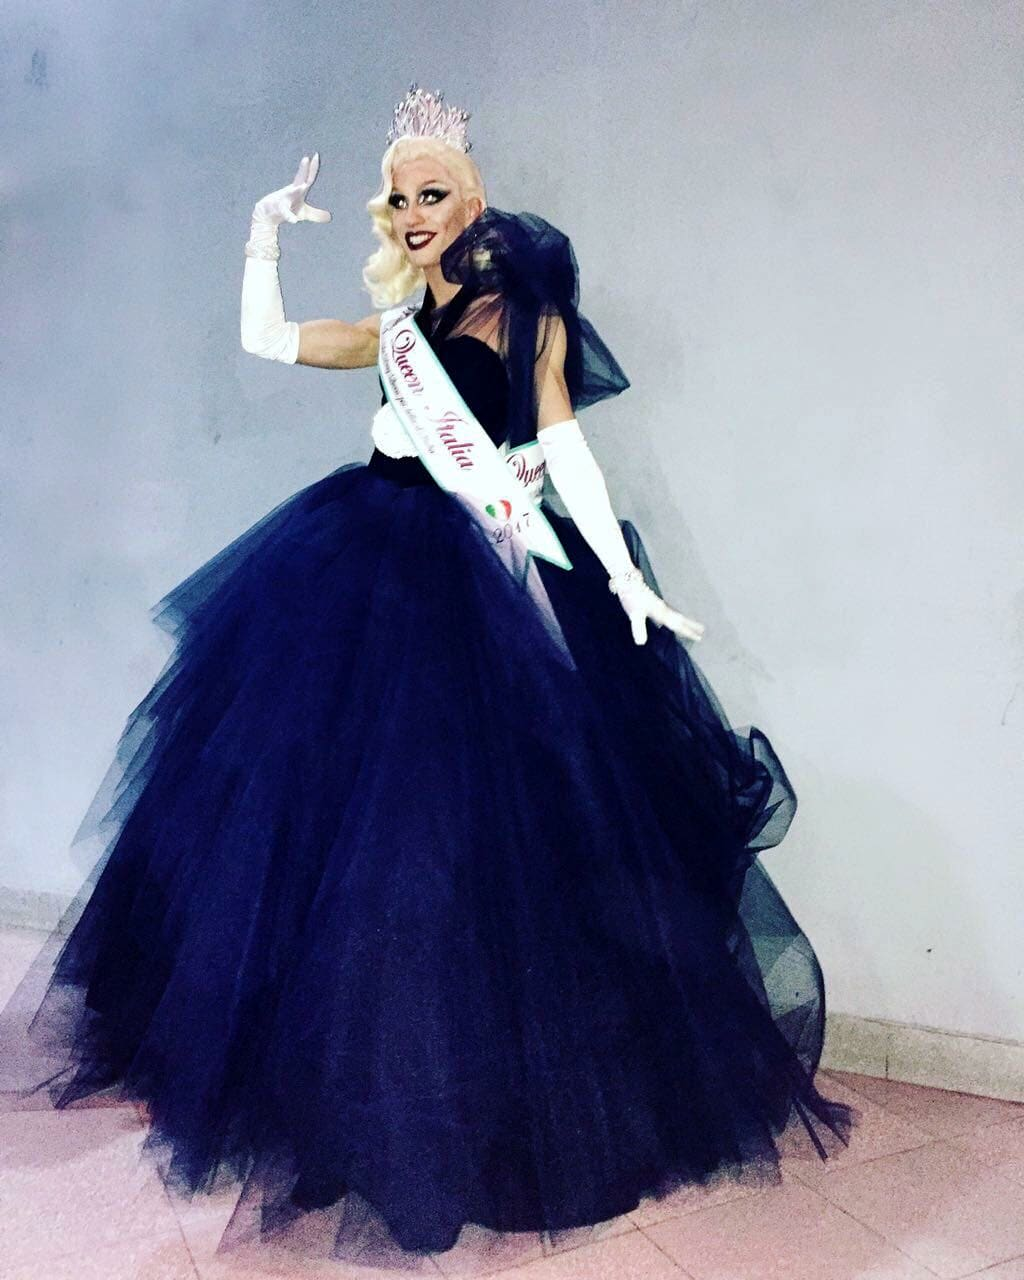 Abiti Da Sera Queen.Eletta La Piu Bella Drag Queen D Italia A Colpi Di Sfilate E Make Up